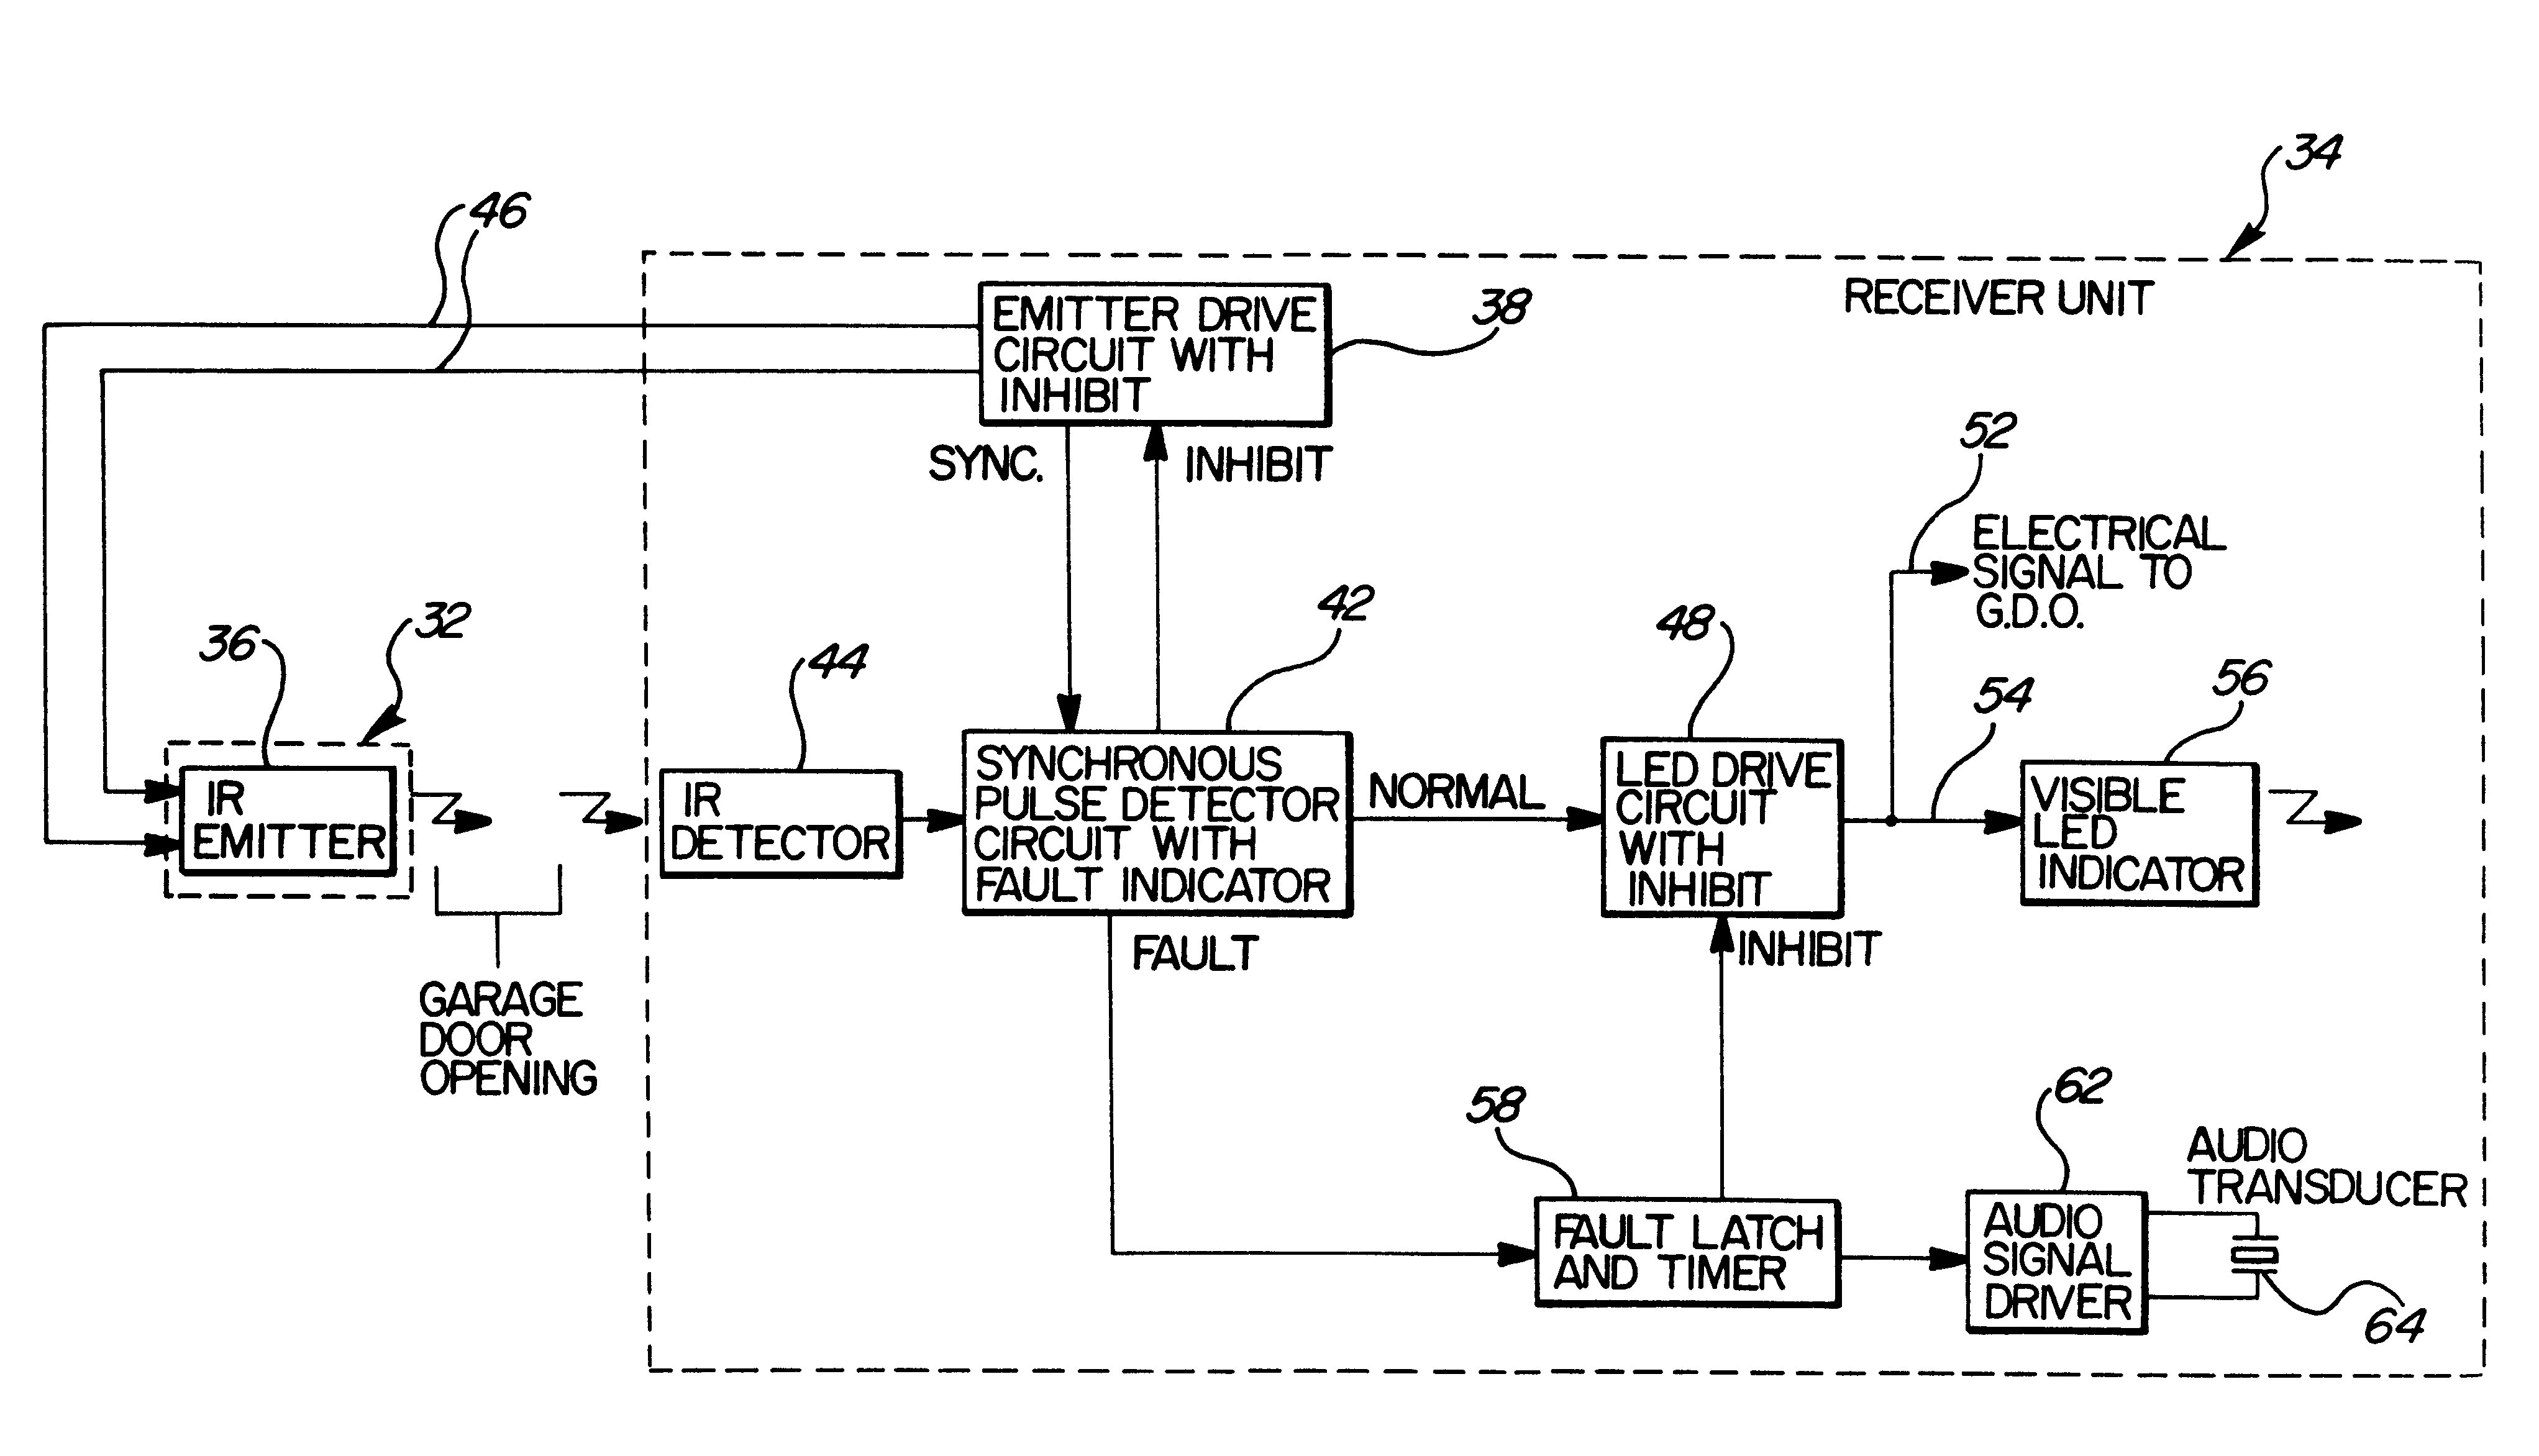 chamberlain garage door wiring diagram | free wiring diagram sears garage door wiring diagram linear garage door wiring diagram #14